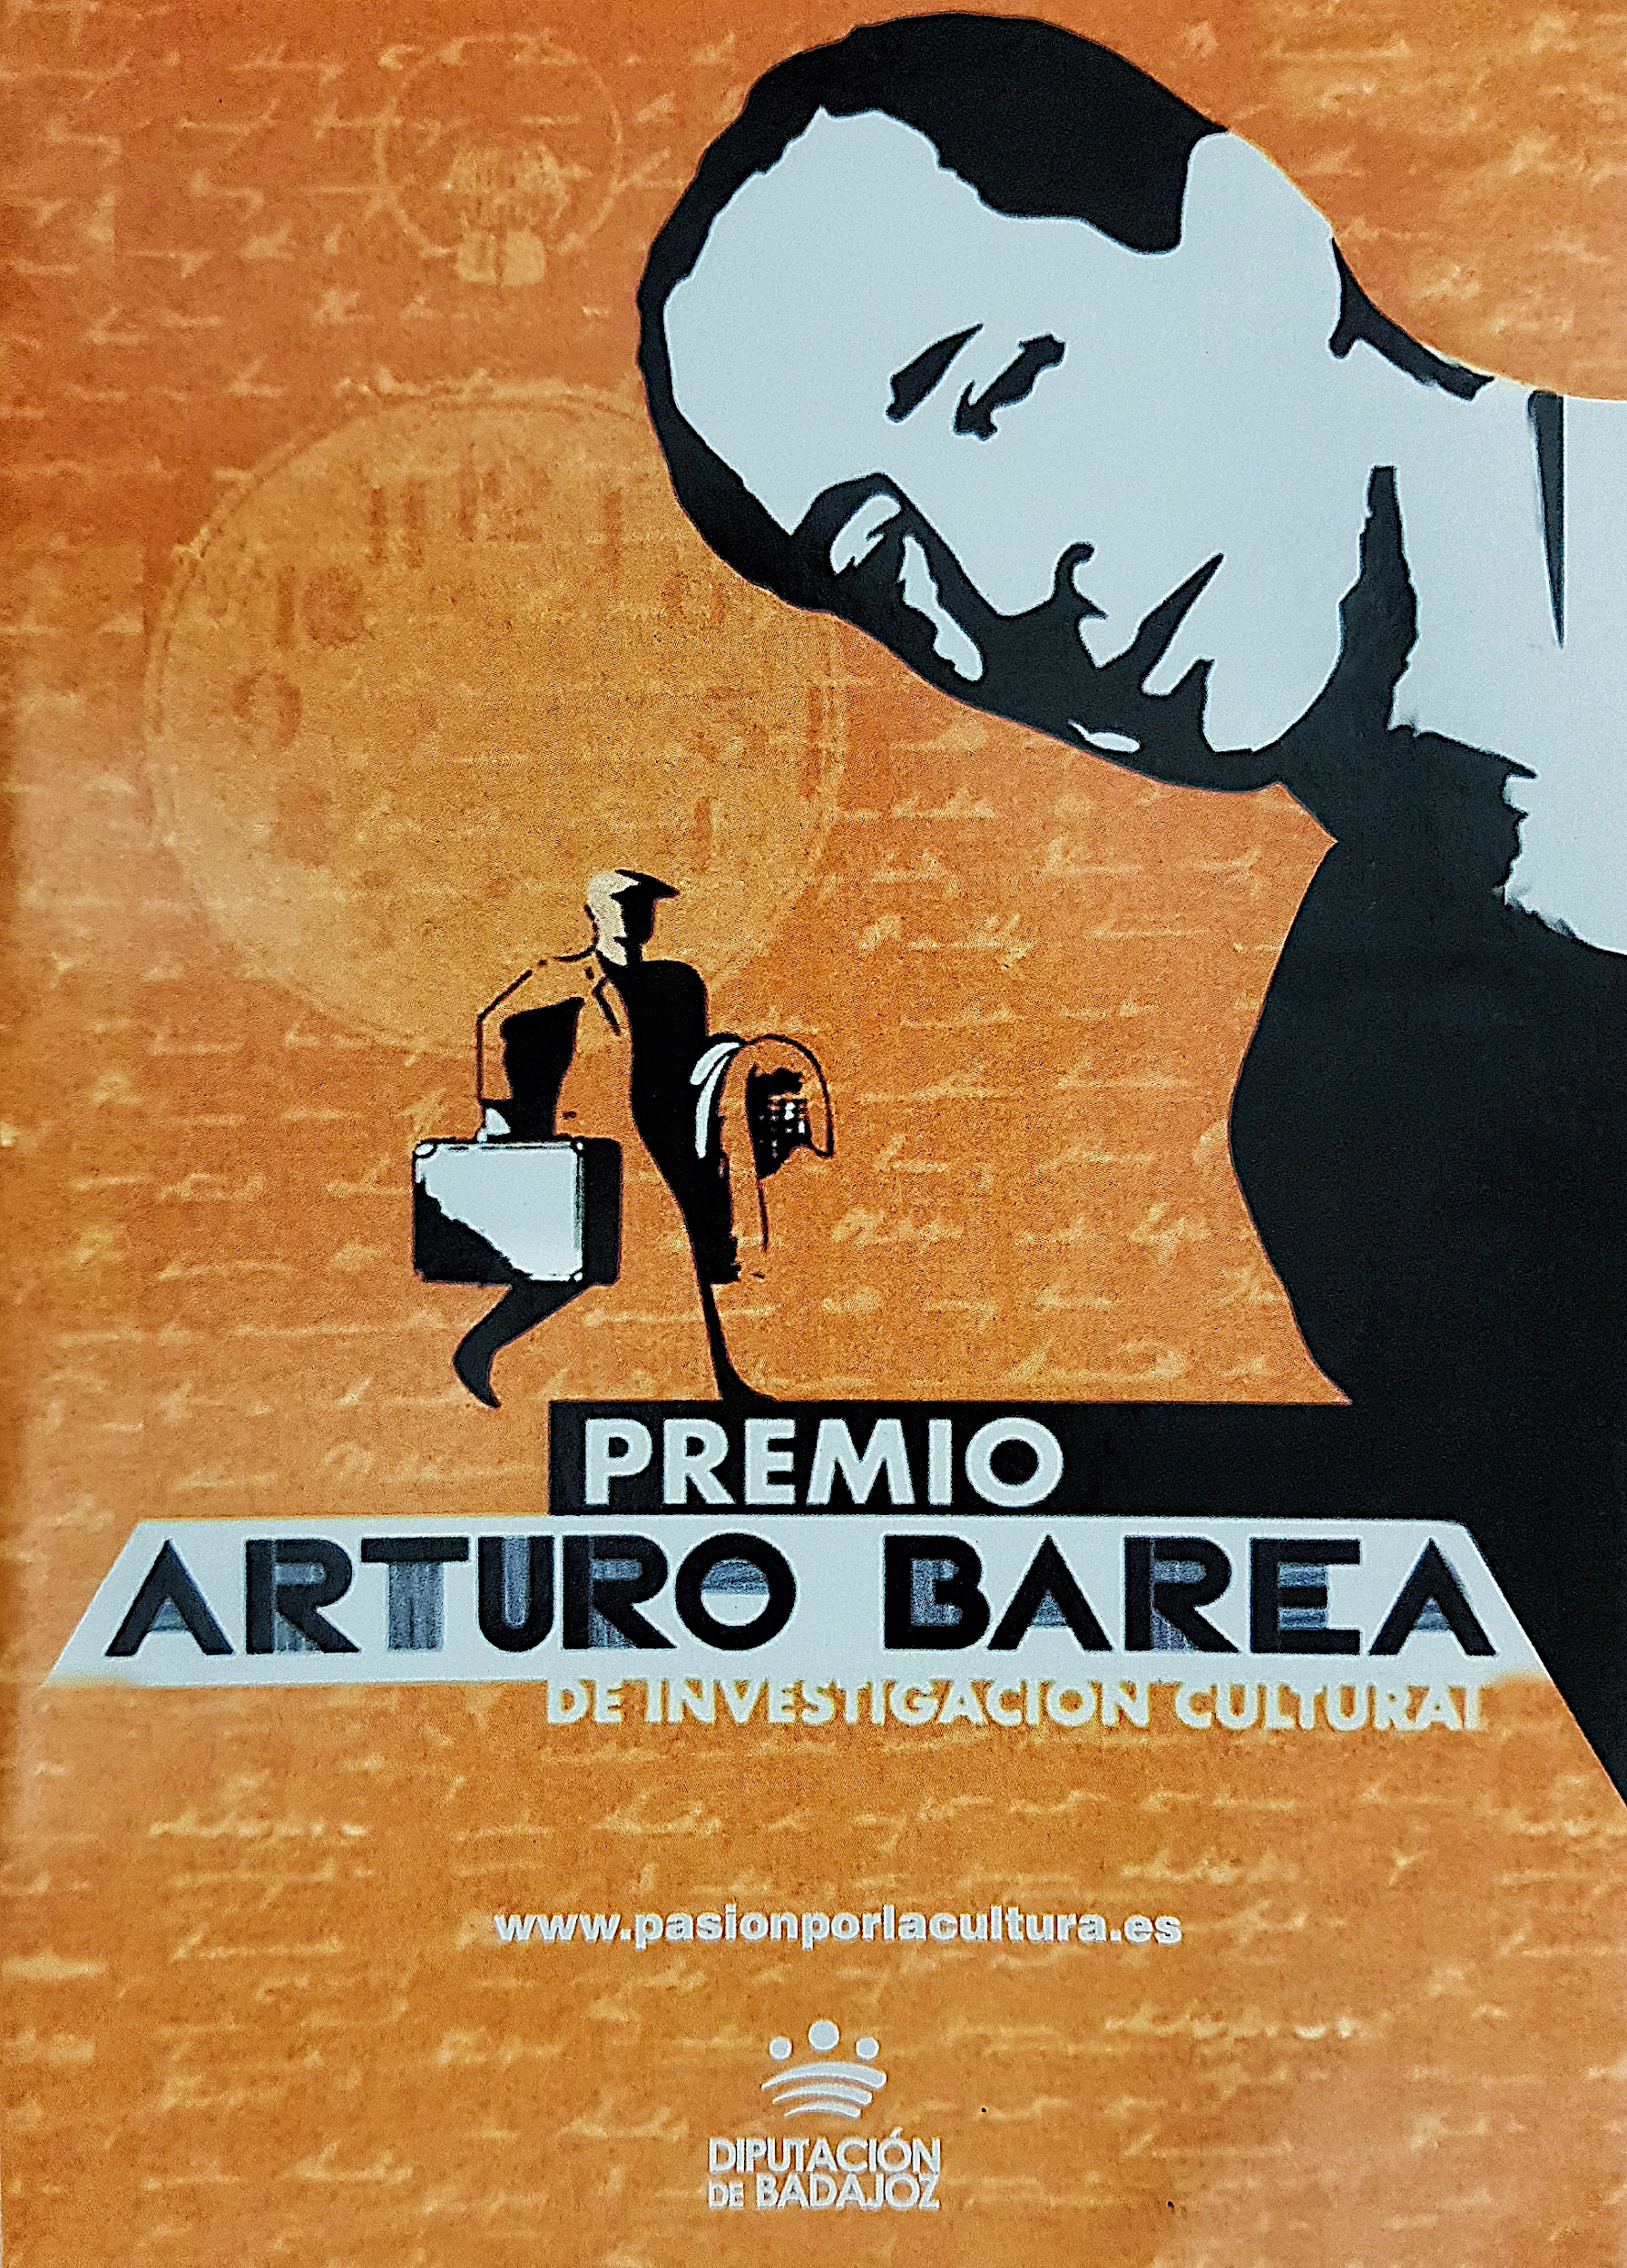 Fallo Premio Arturo Barea 2019 cartel